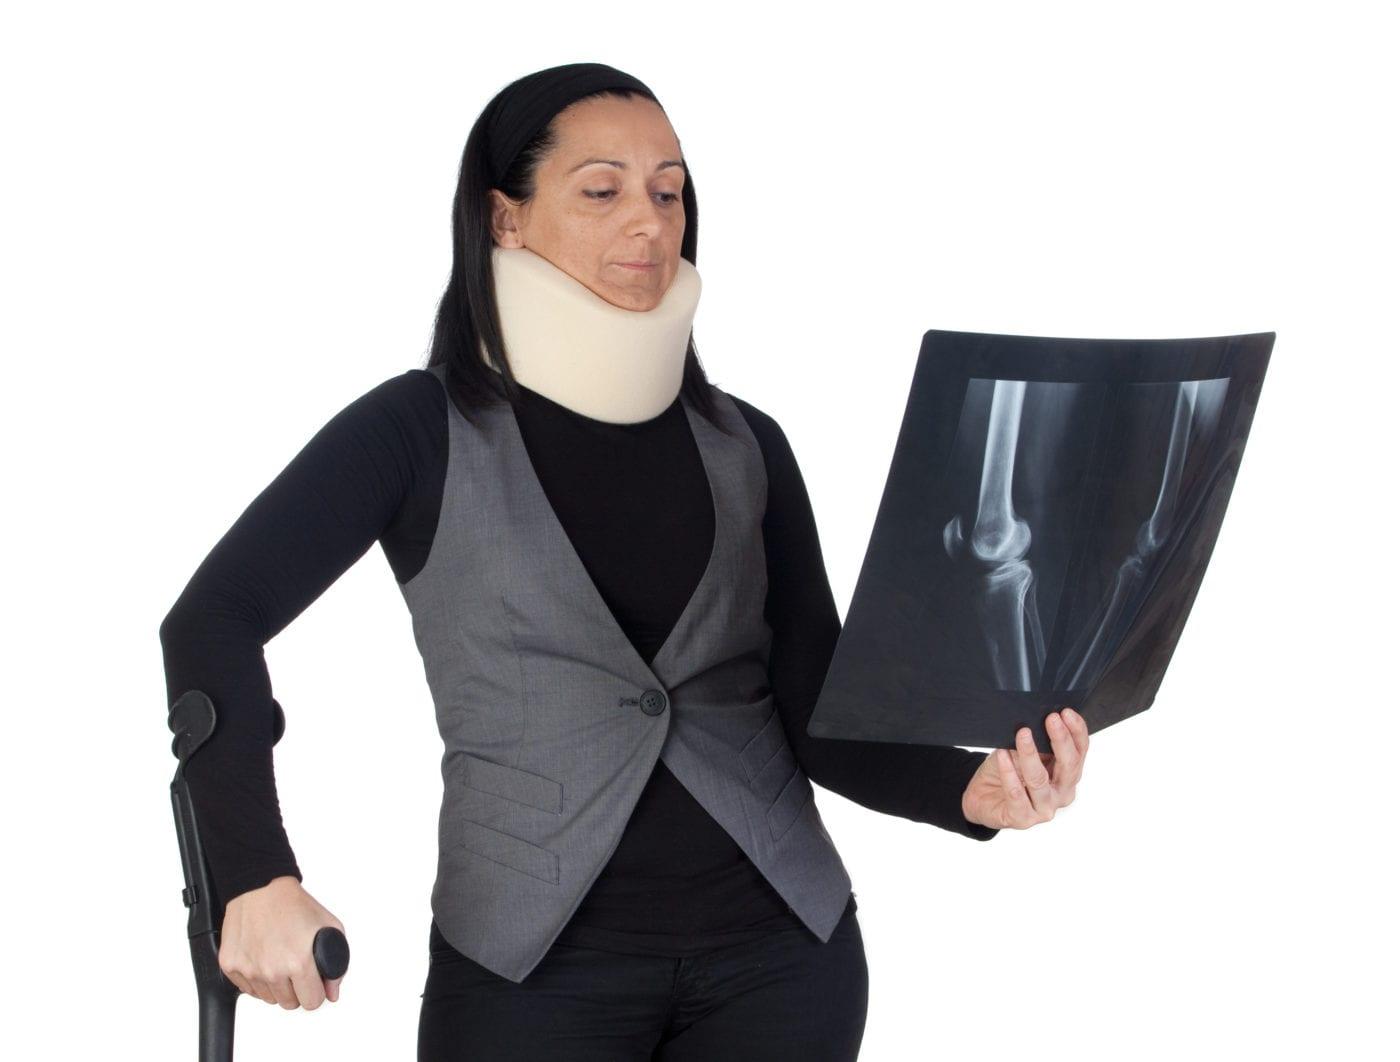 Car Accident Chiropractor In Phoenix